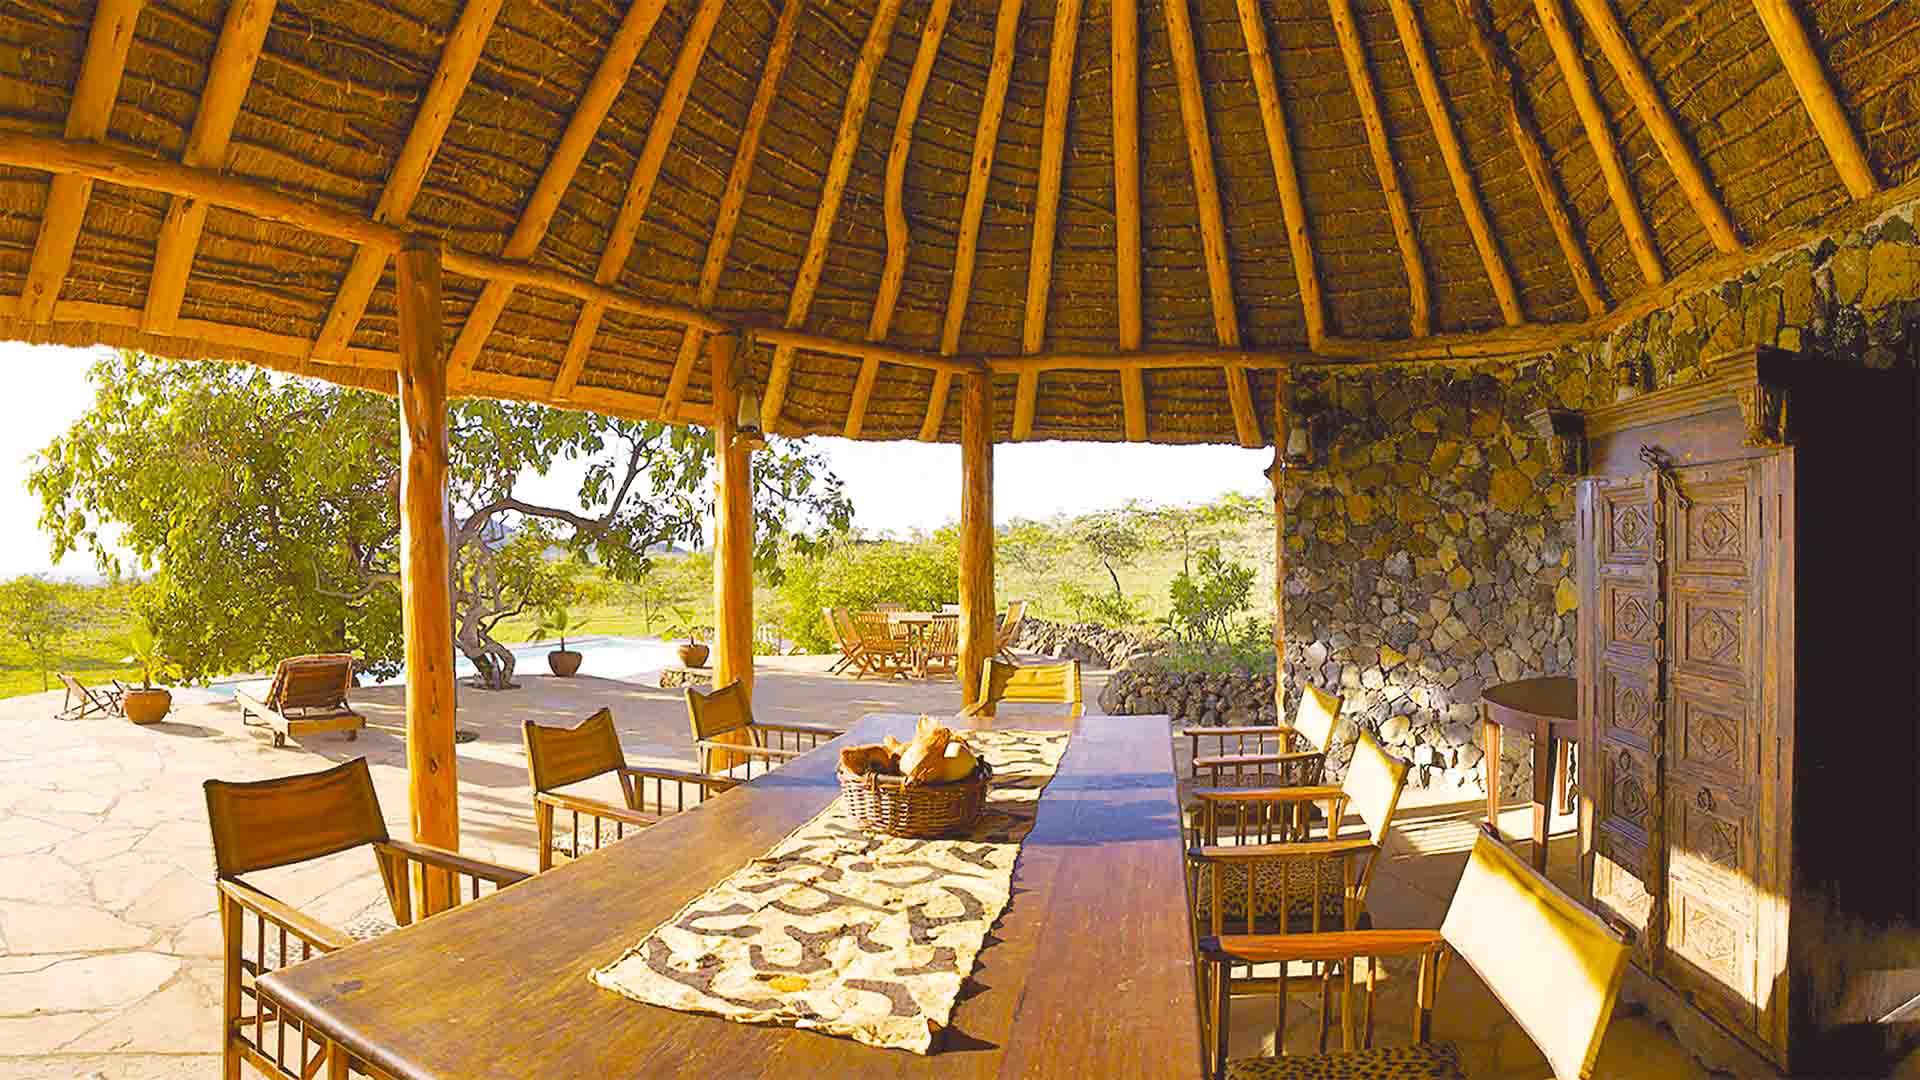 Fireplace and guests area at Campi ya Kanzi, Kenya.